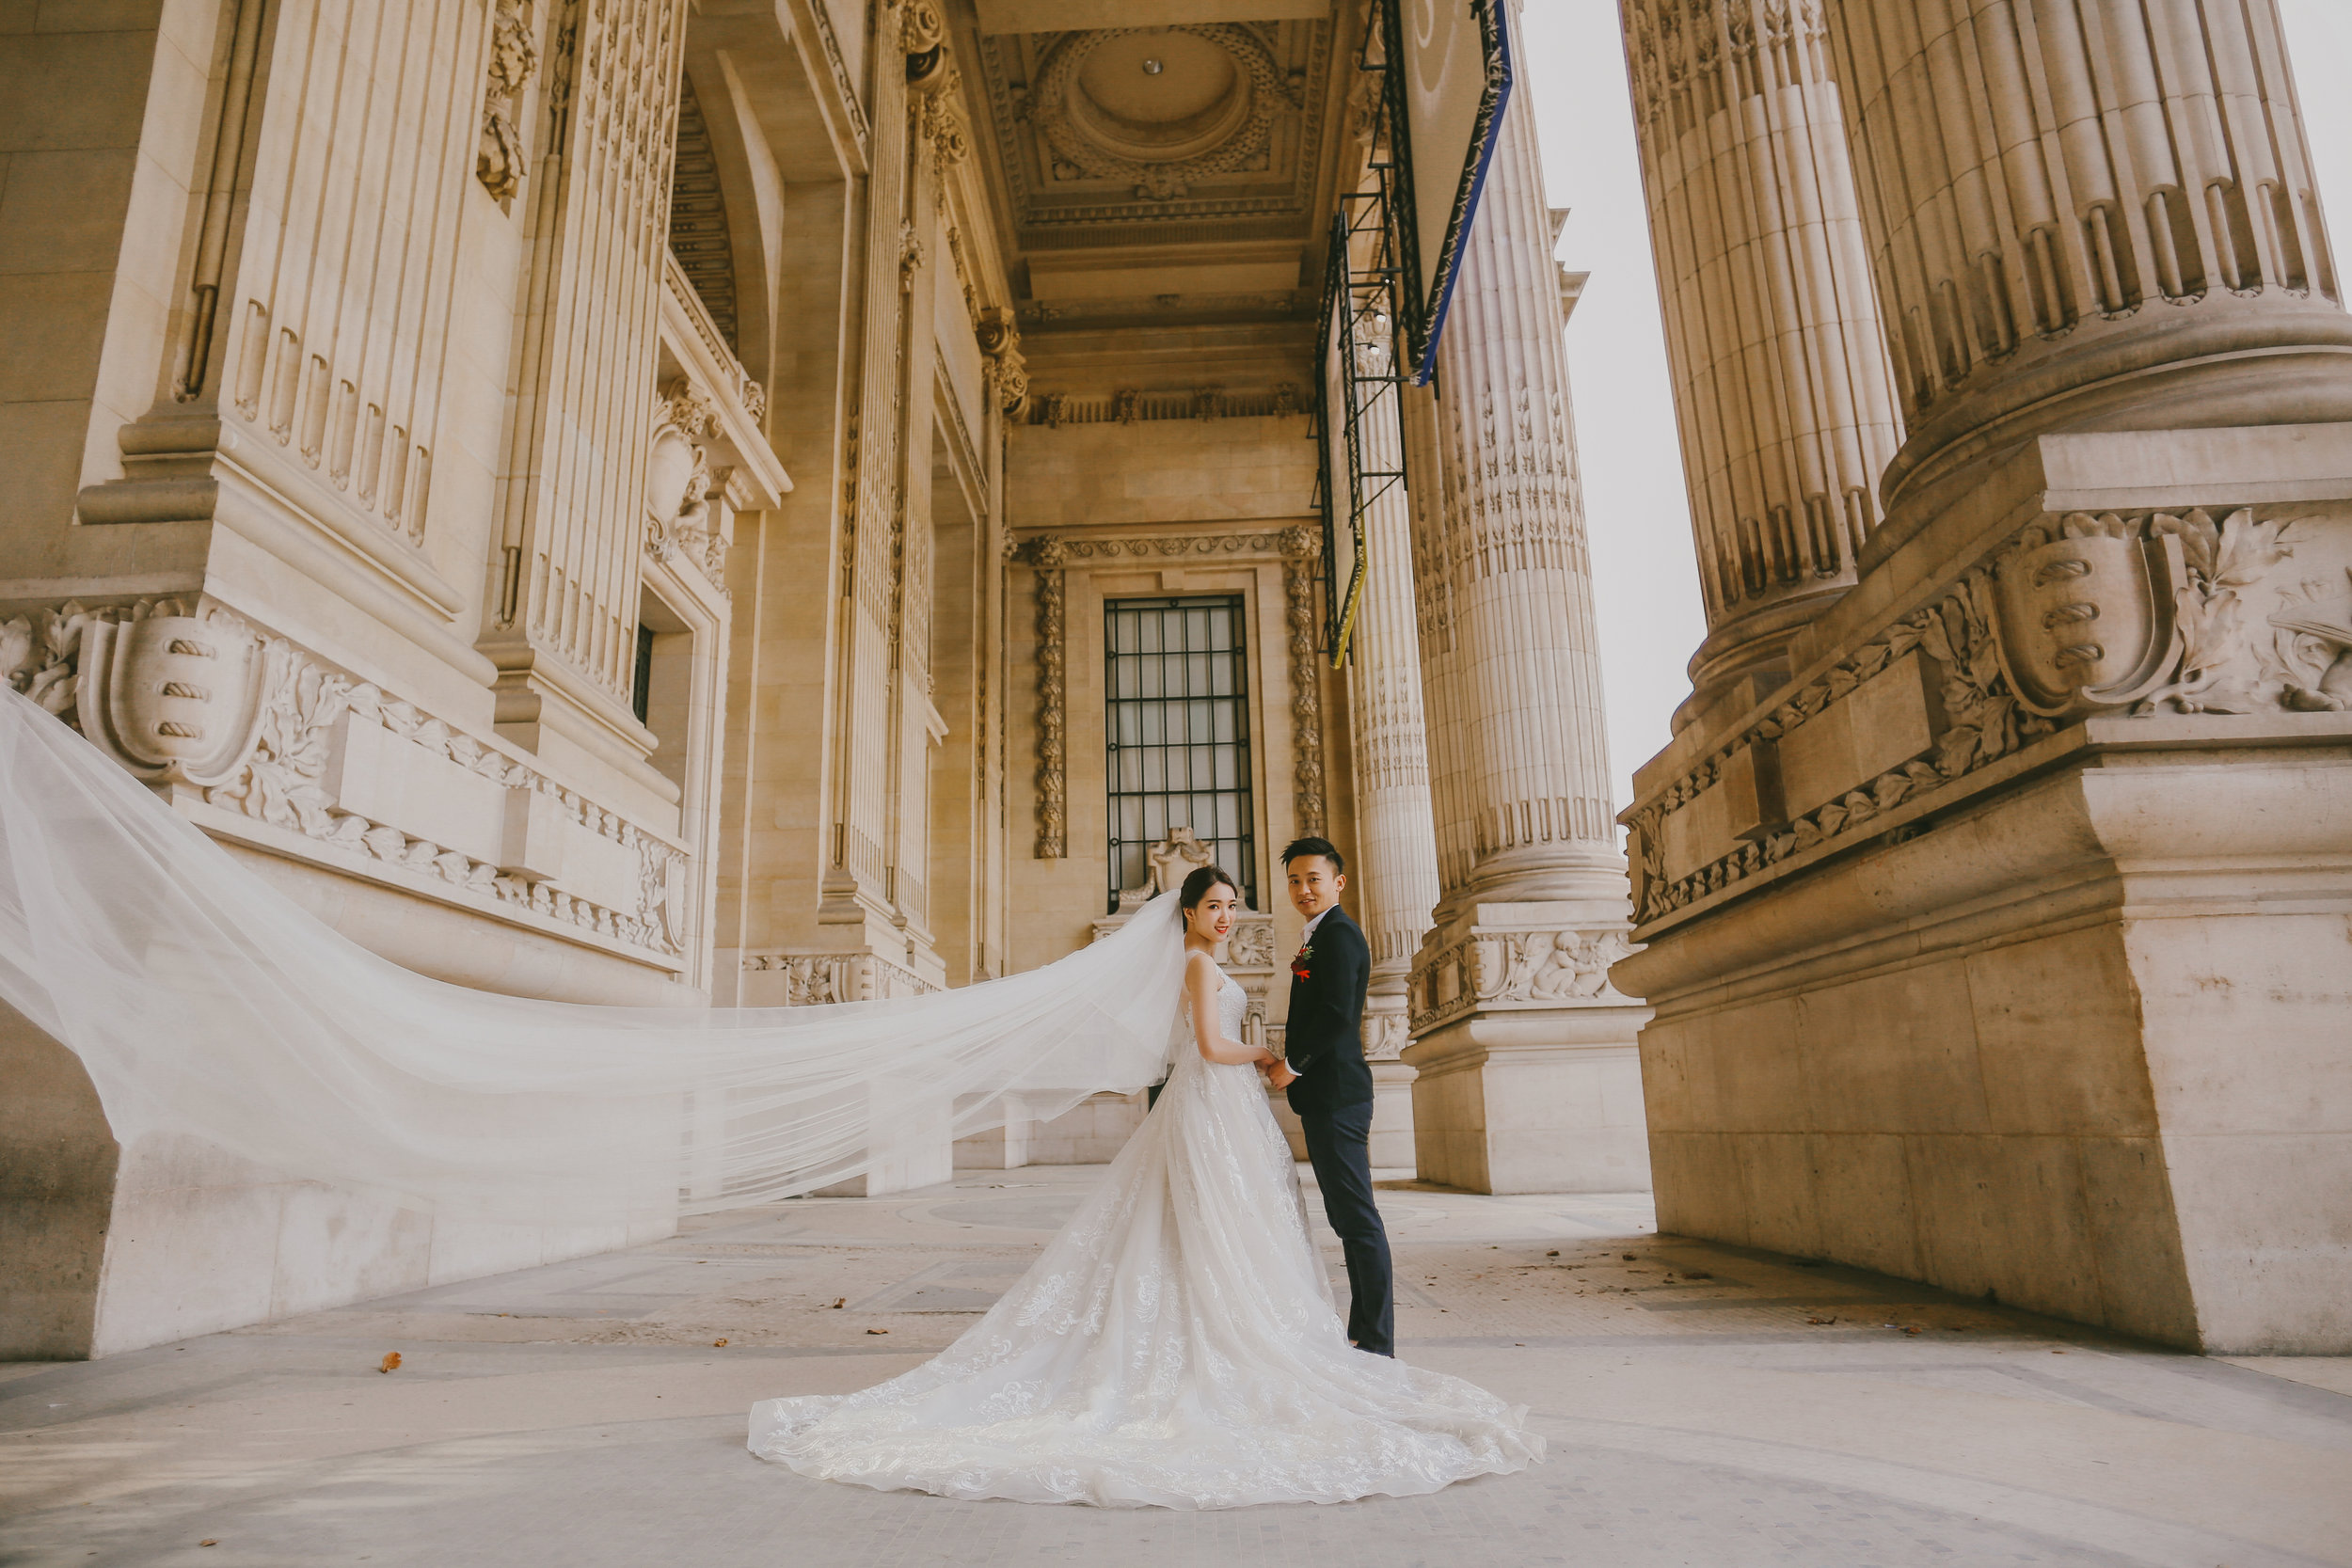 2018-pre-wedding-studio-numb9r-paris-high-1917e.jpg